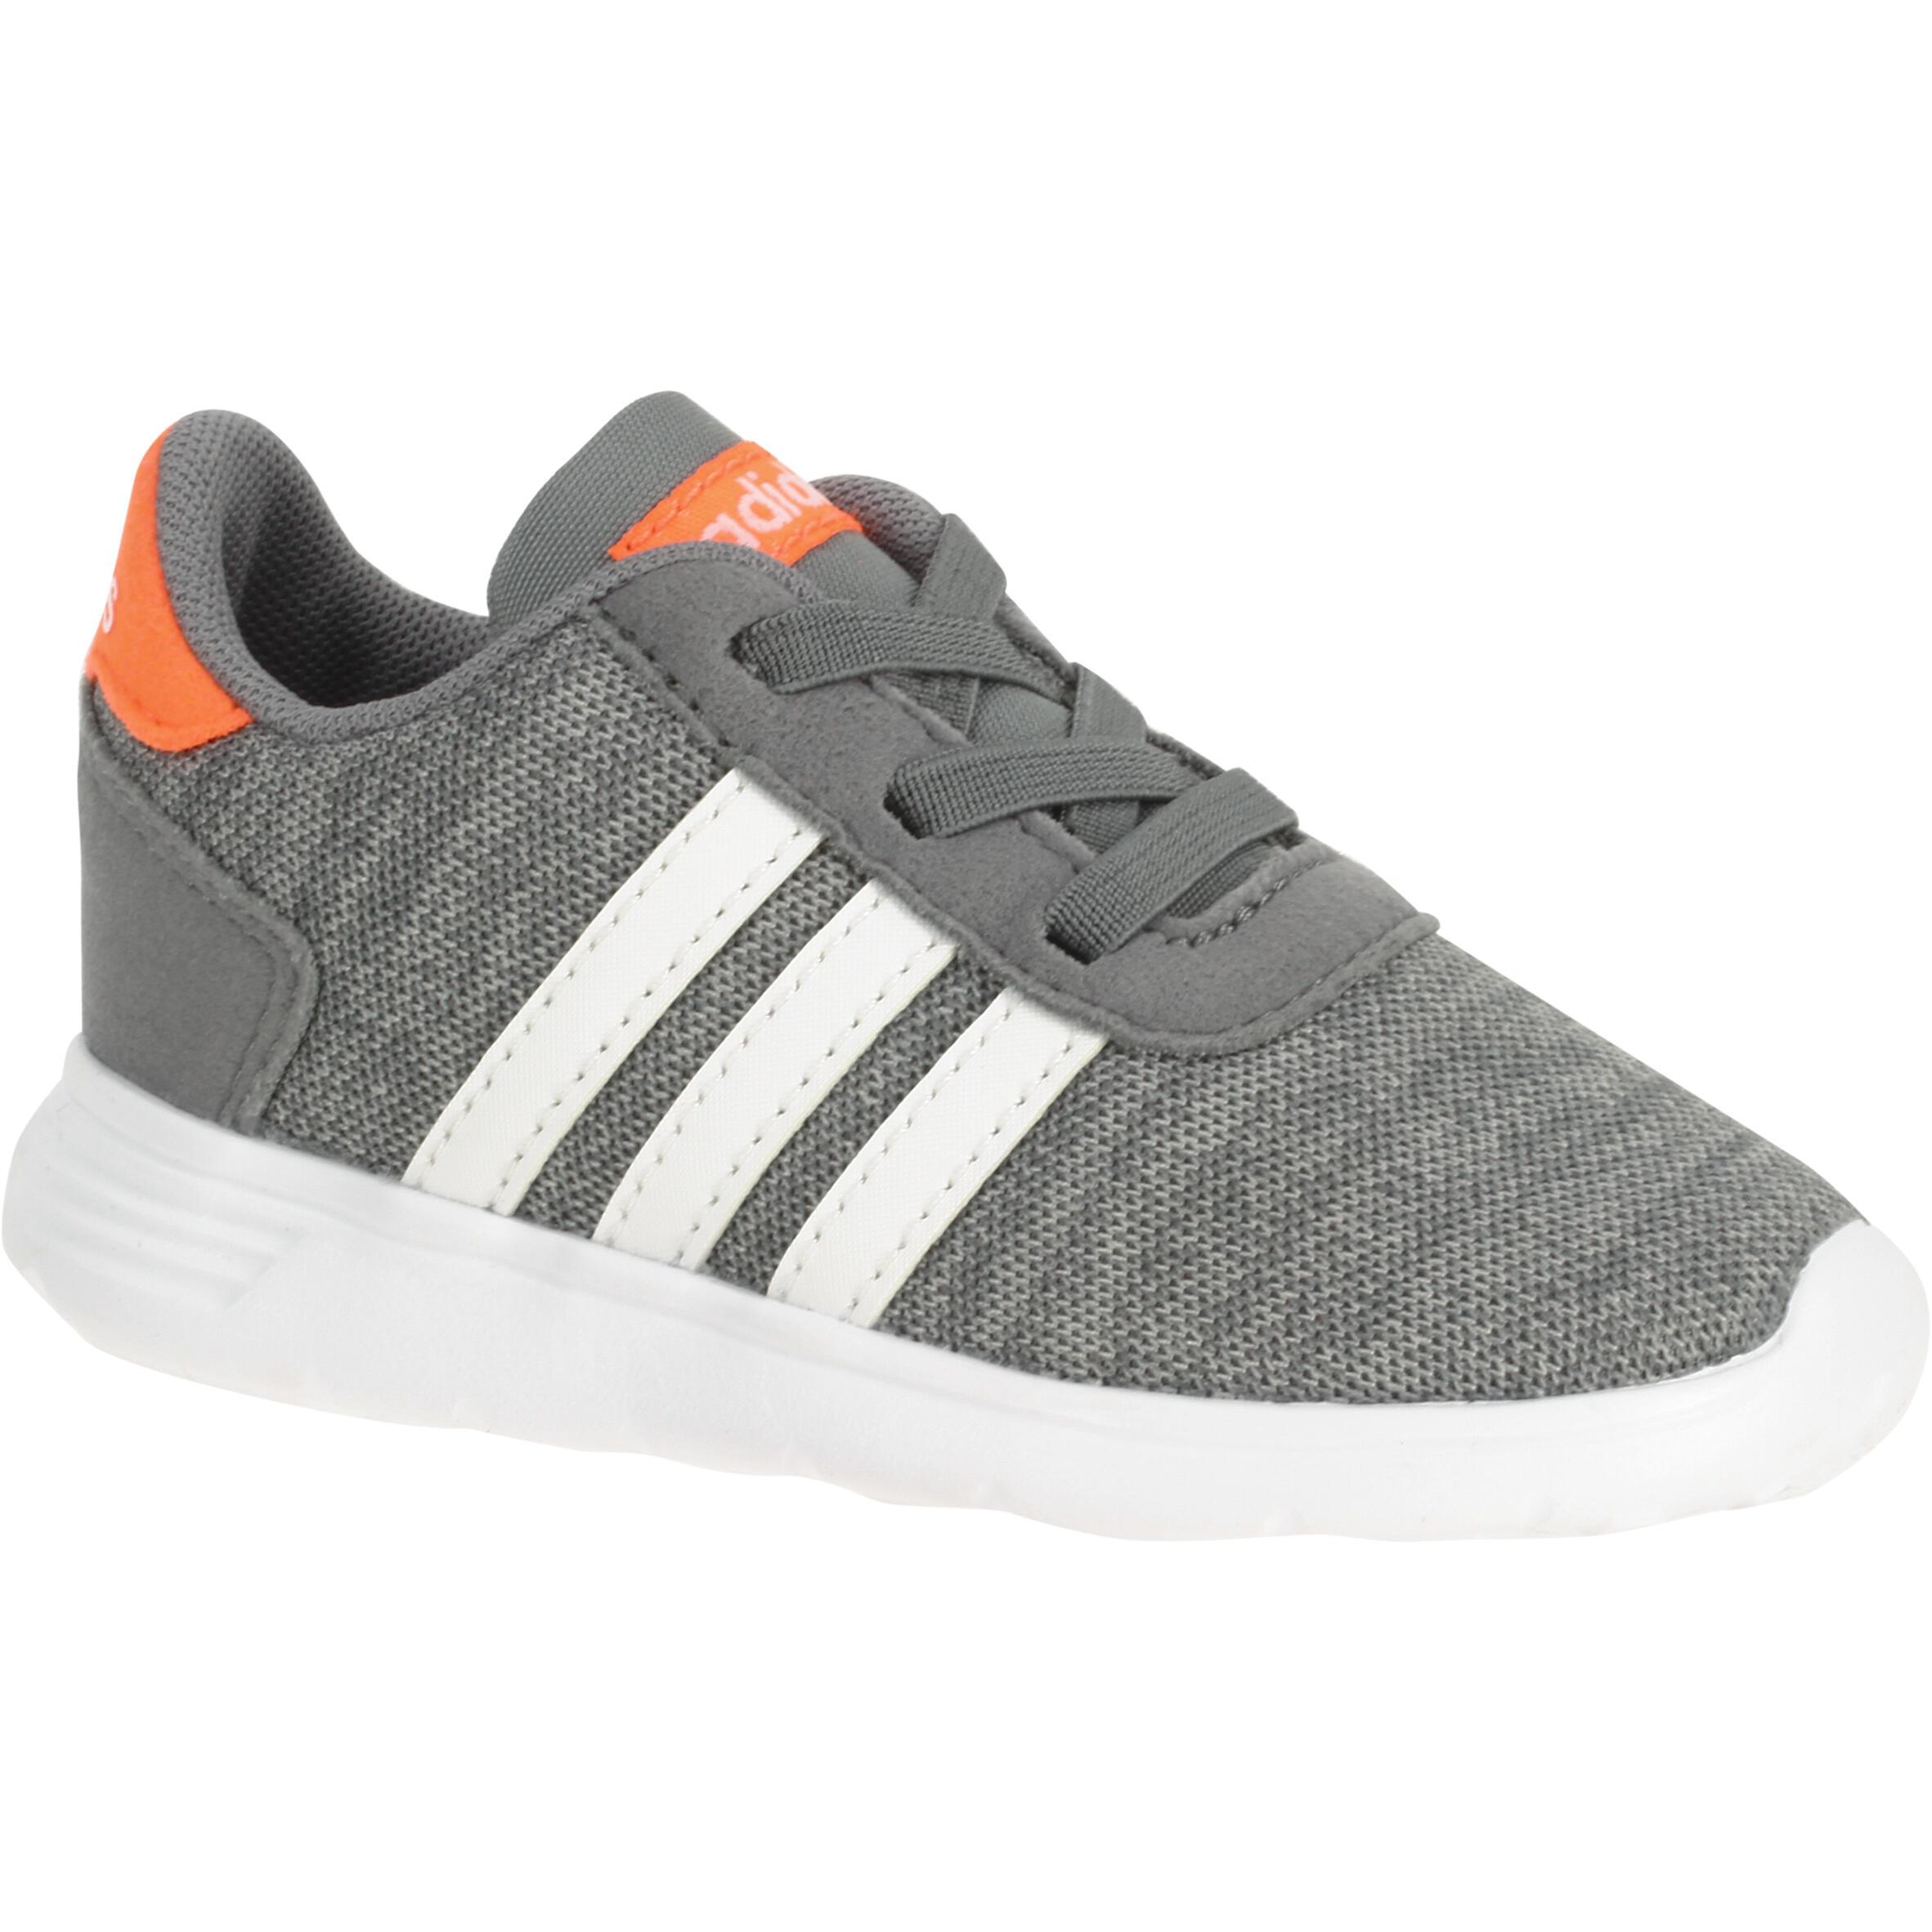 Adidas Adidas G1 BB jongens 2018 gemêleerd grijs